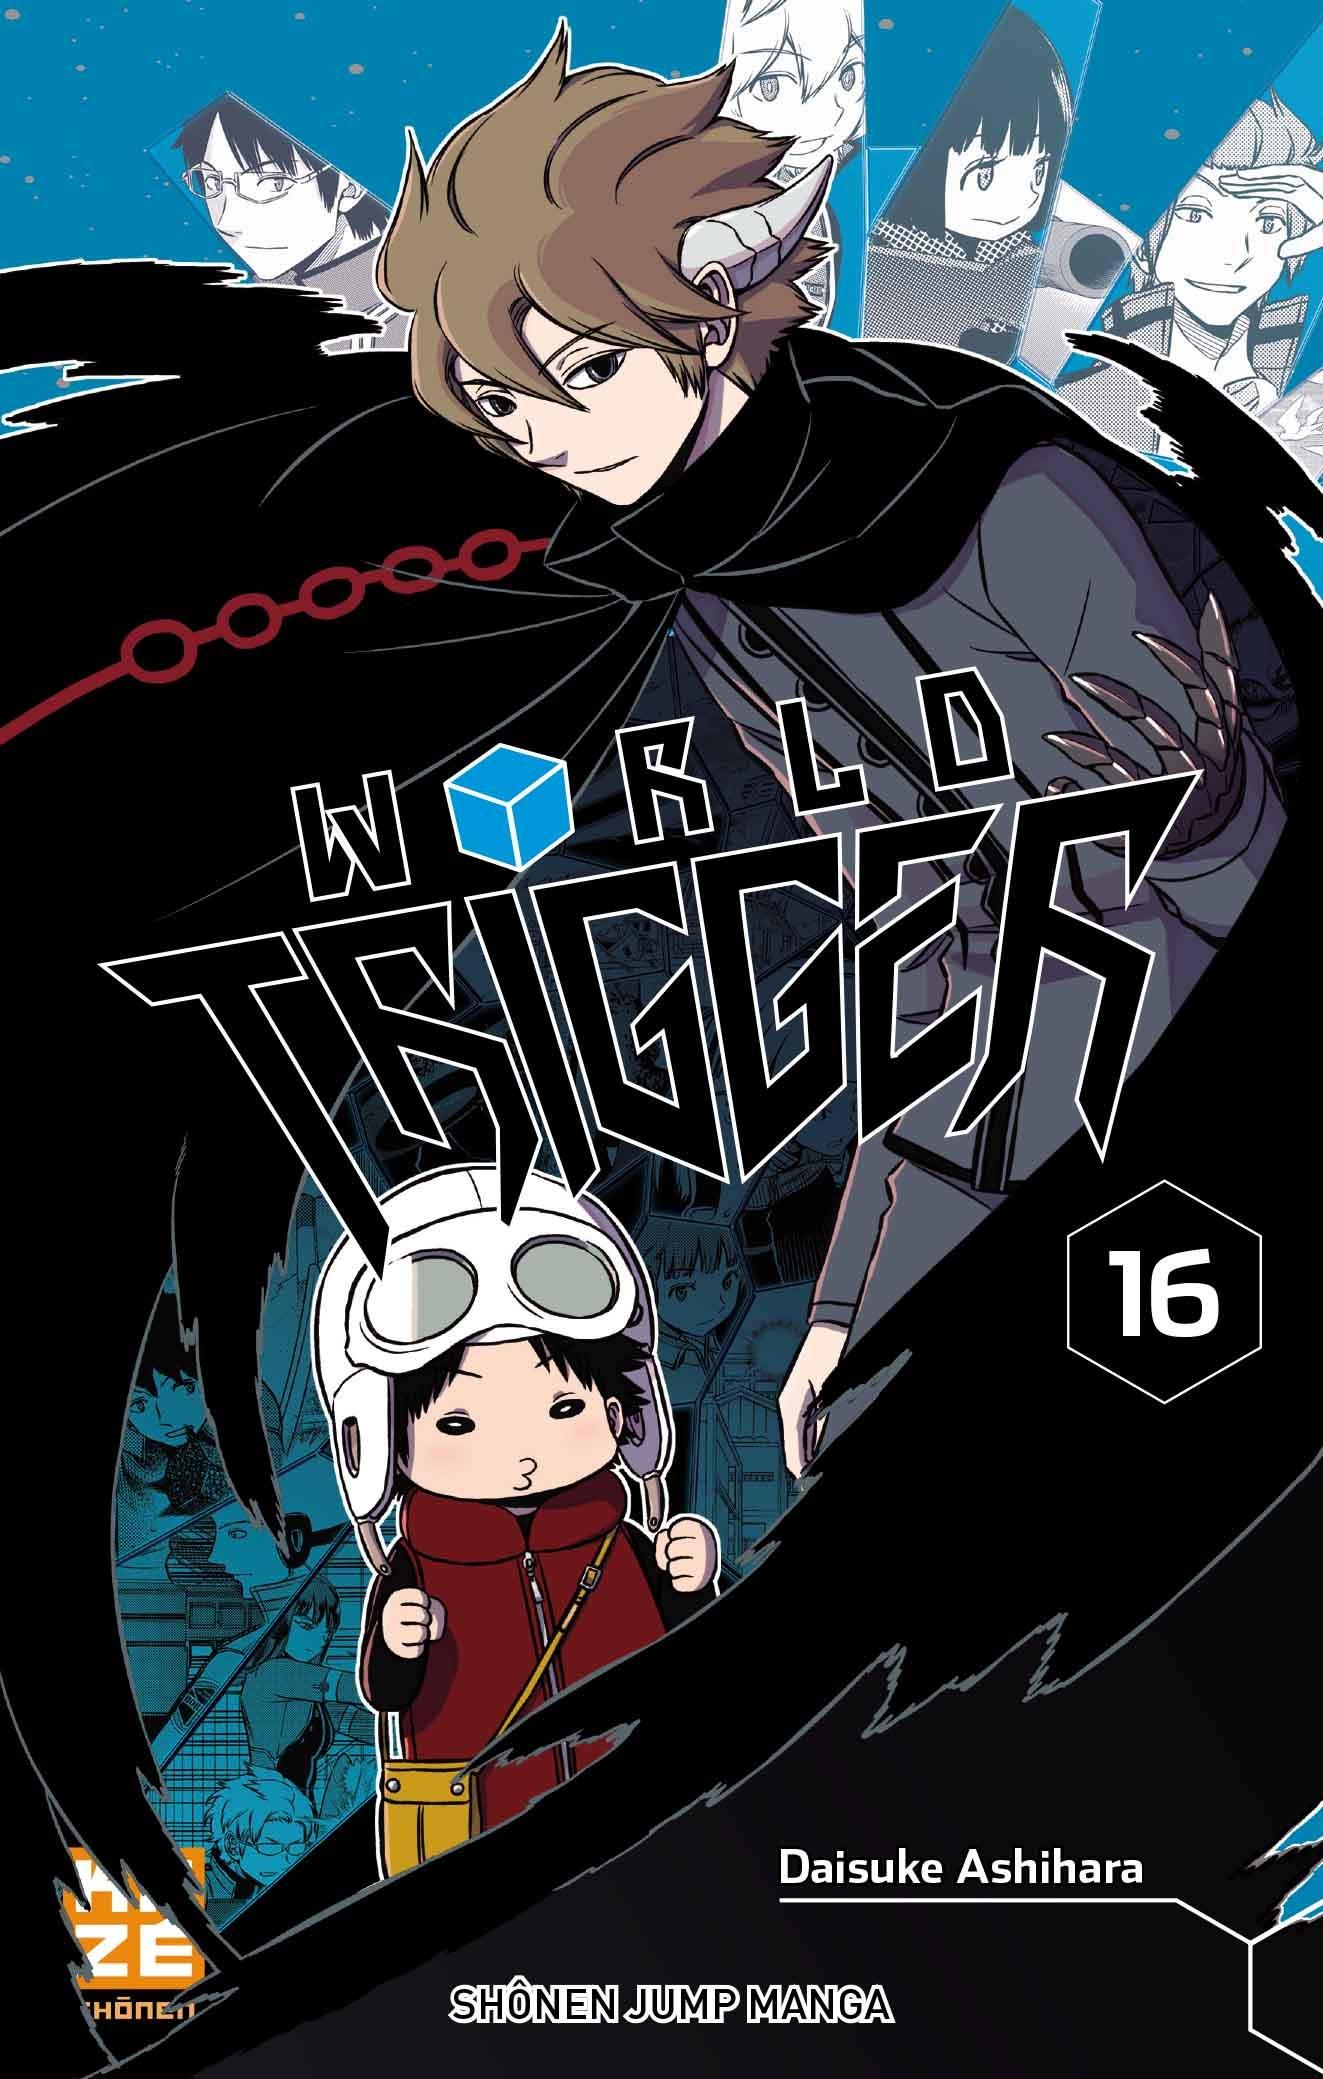 World Trigger 16